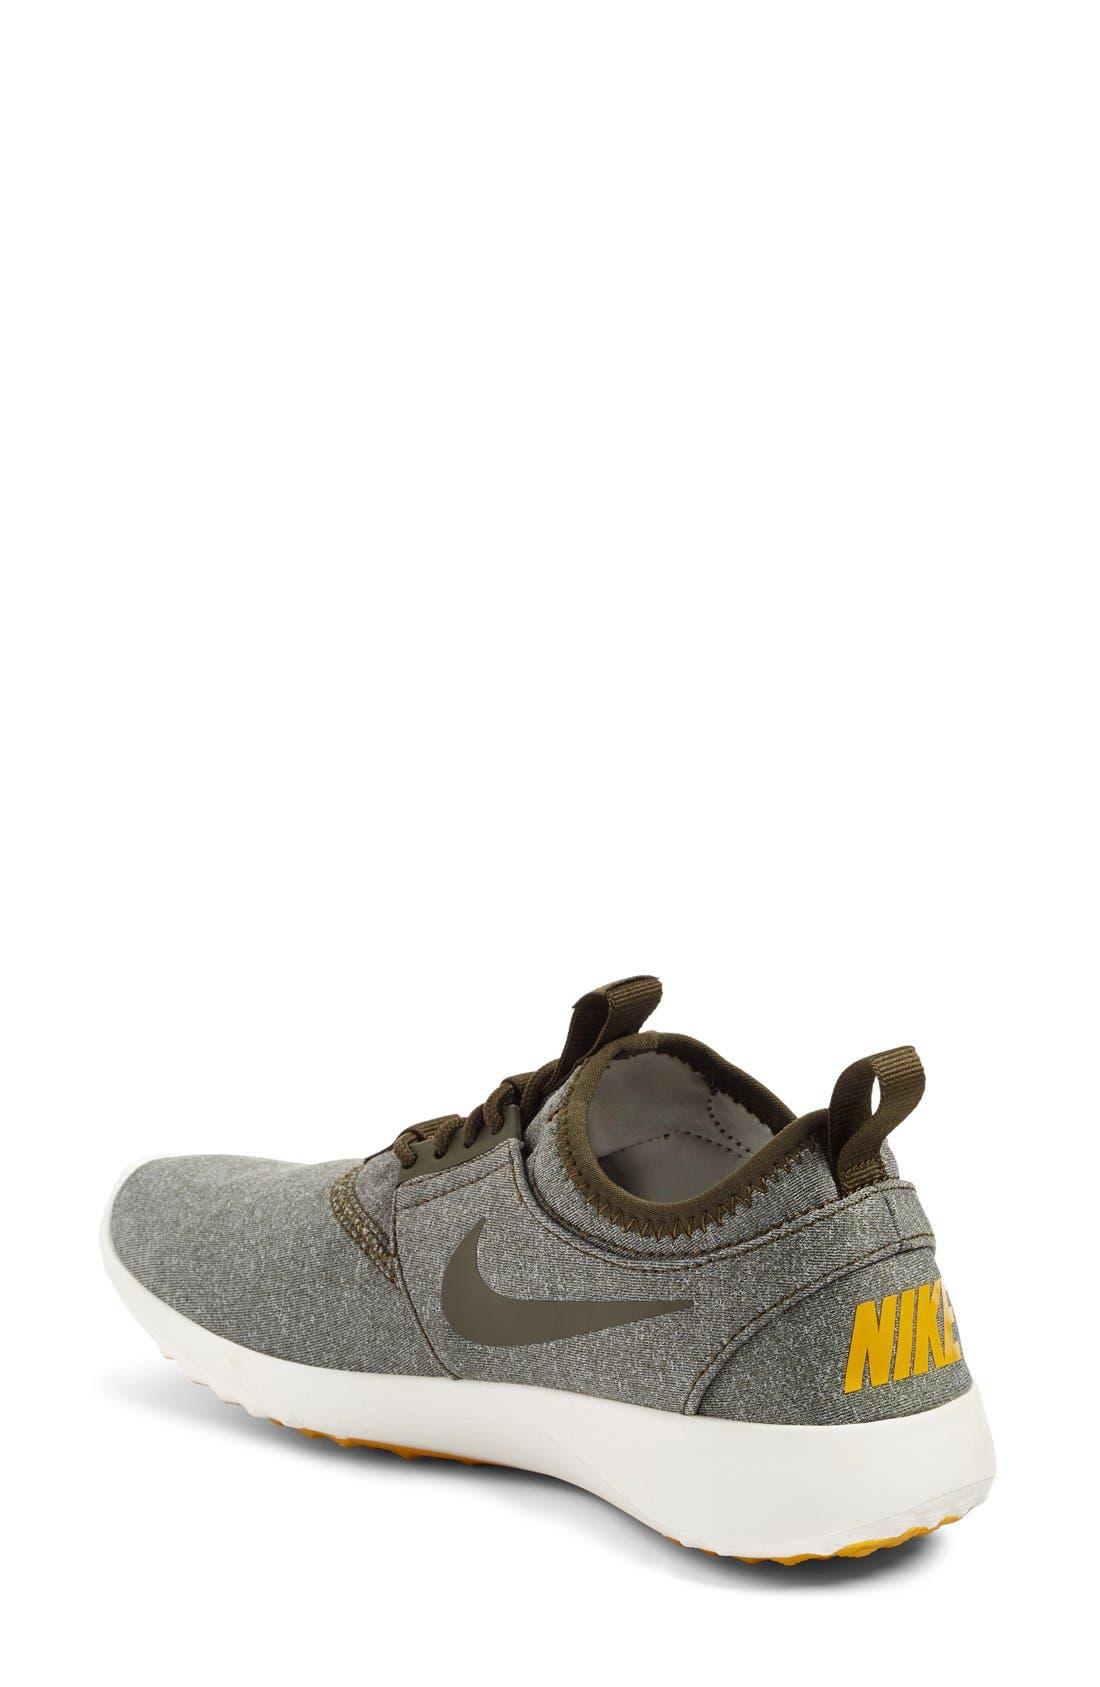 Juvenate SE Sneaker,                             Alternate thumbnail 50, color,